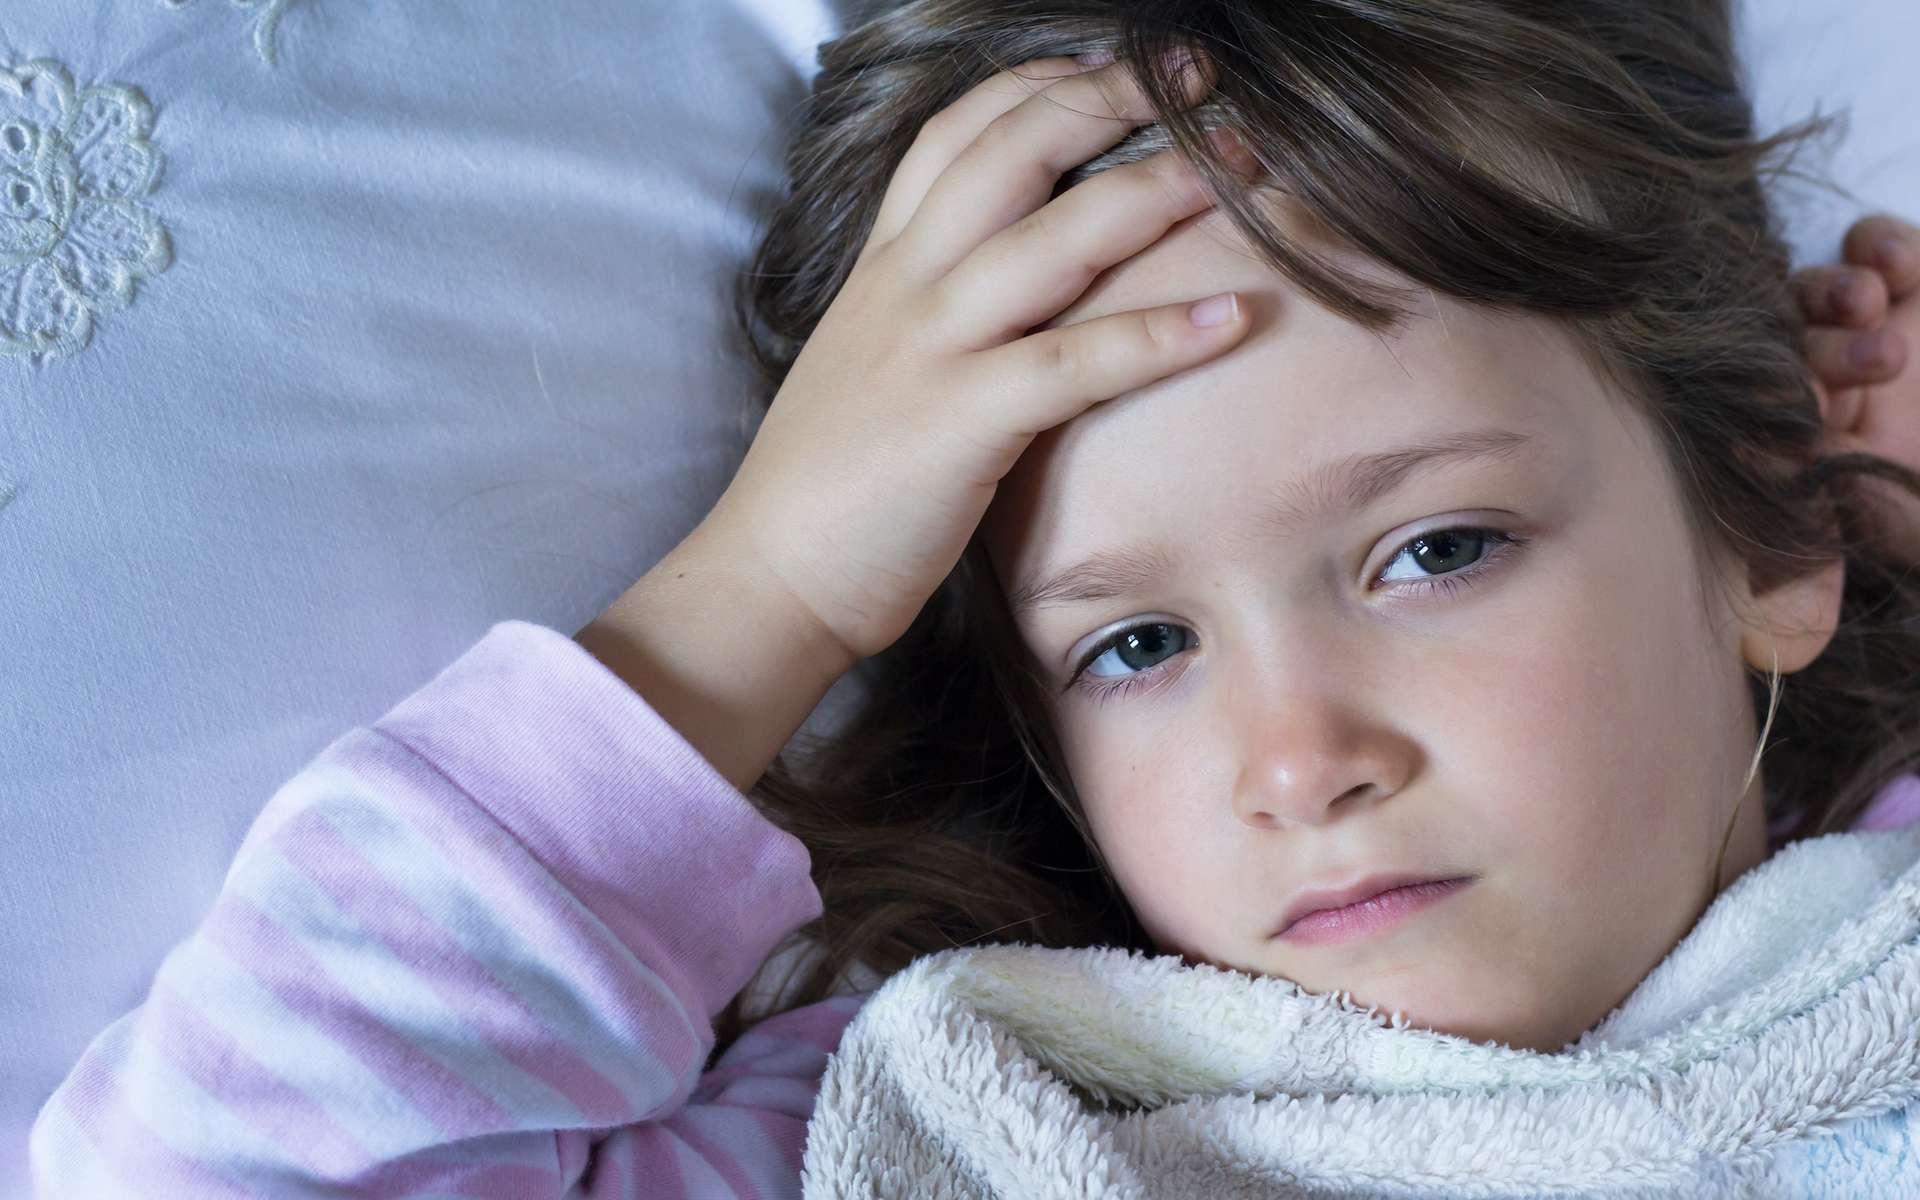 La maladie périodique est une maladie héréditaire auto-inflammatoire. © Marija, Adobe Stock